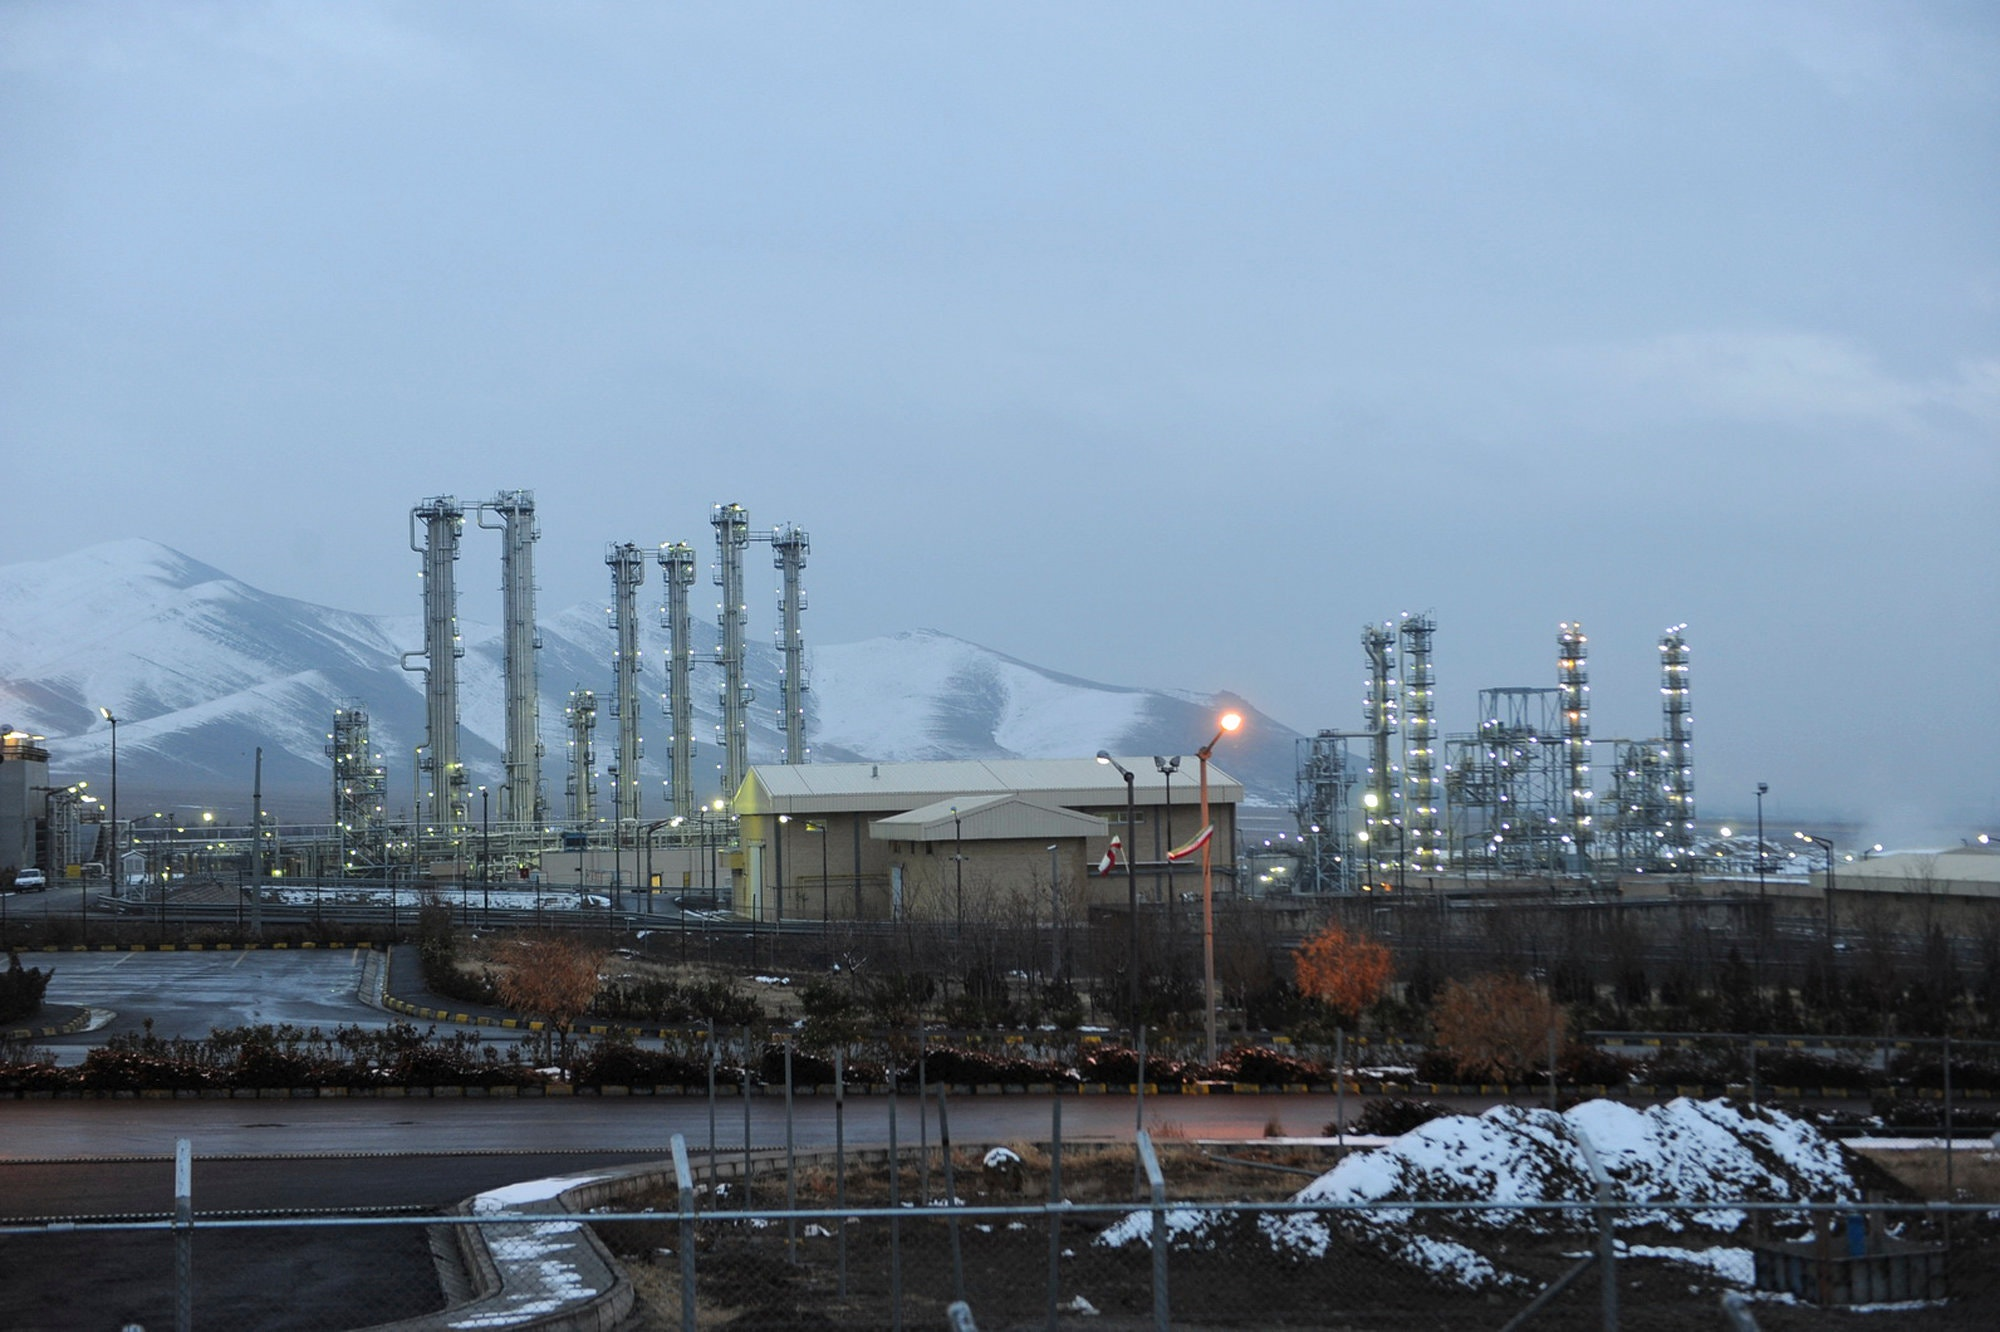 Iran's Arak nuclear plant in 2011. Credit Hamid Foroutan/Iranian Students News Agency, via Associated Press